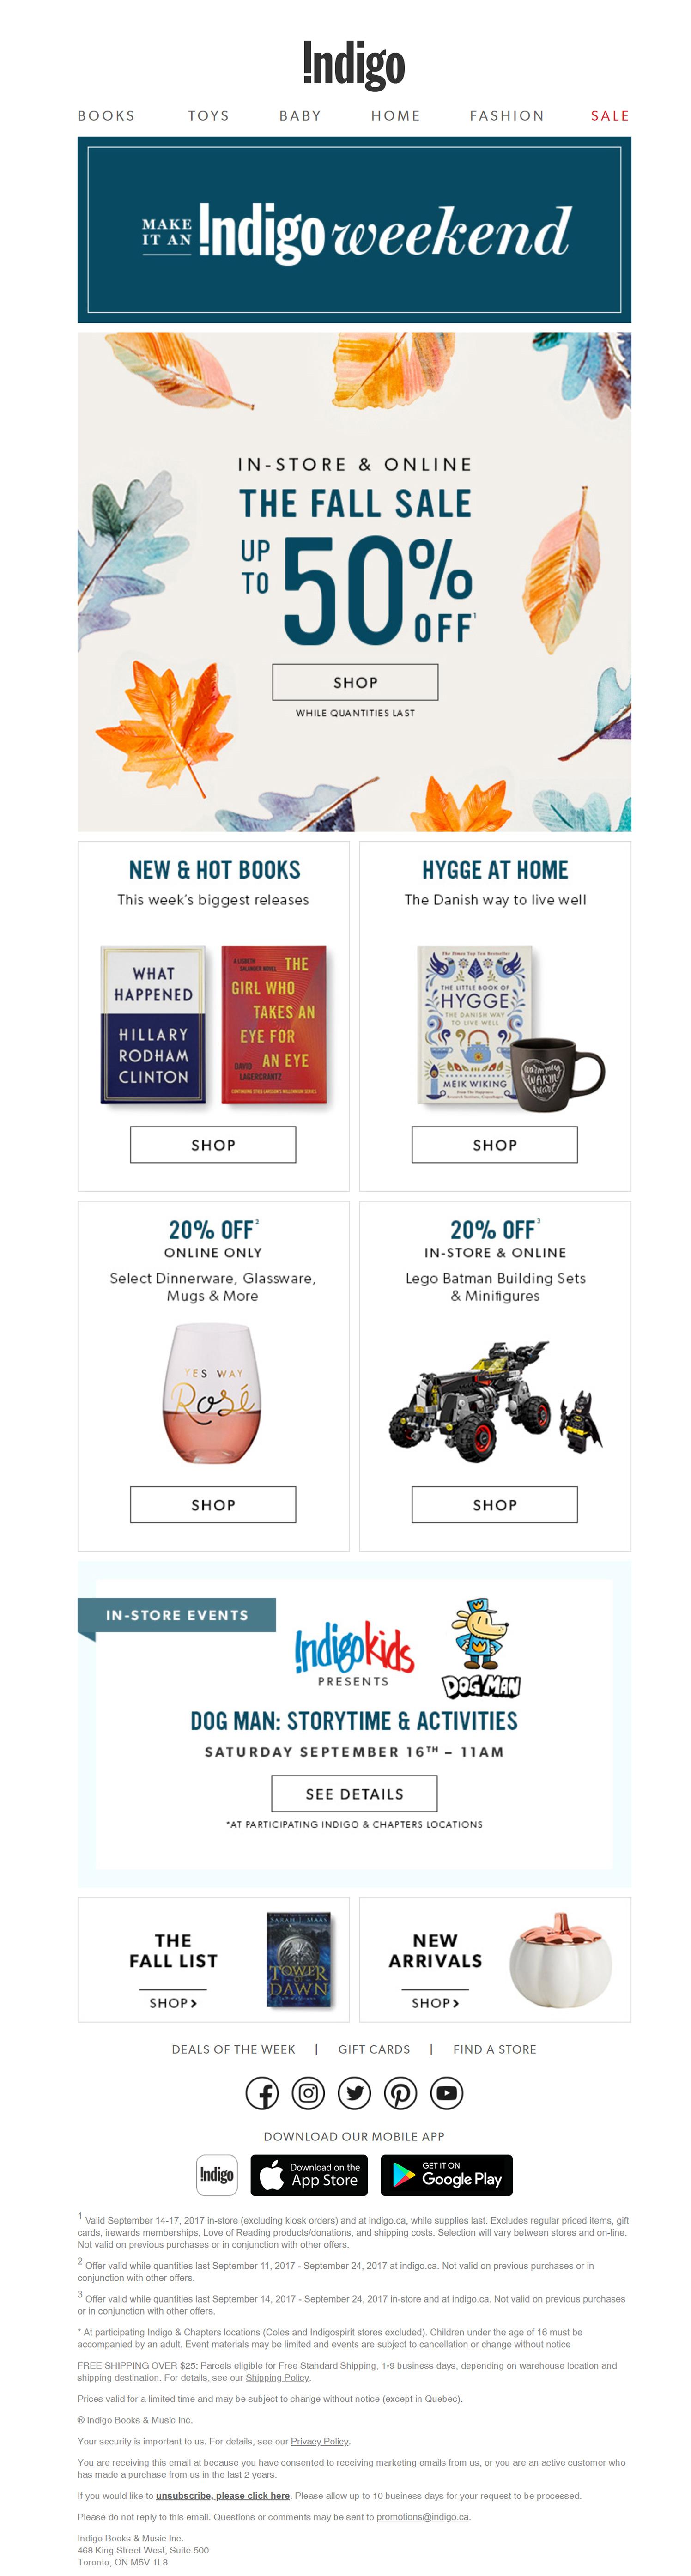 461f30000f7d screencapture-milled-indigo-books-music-fall-sale-save-